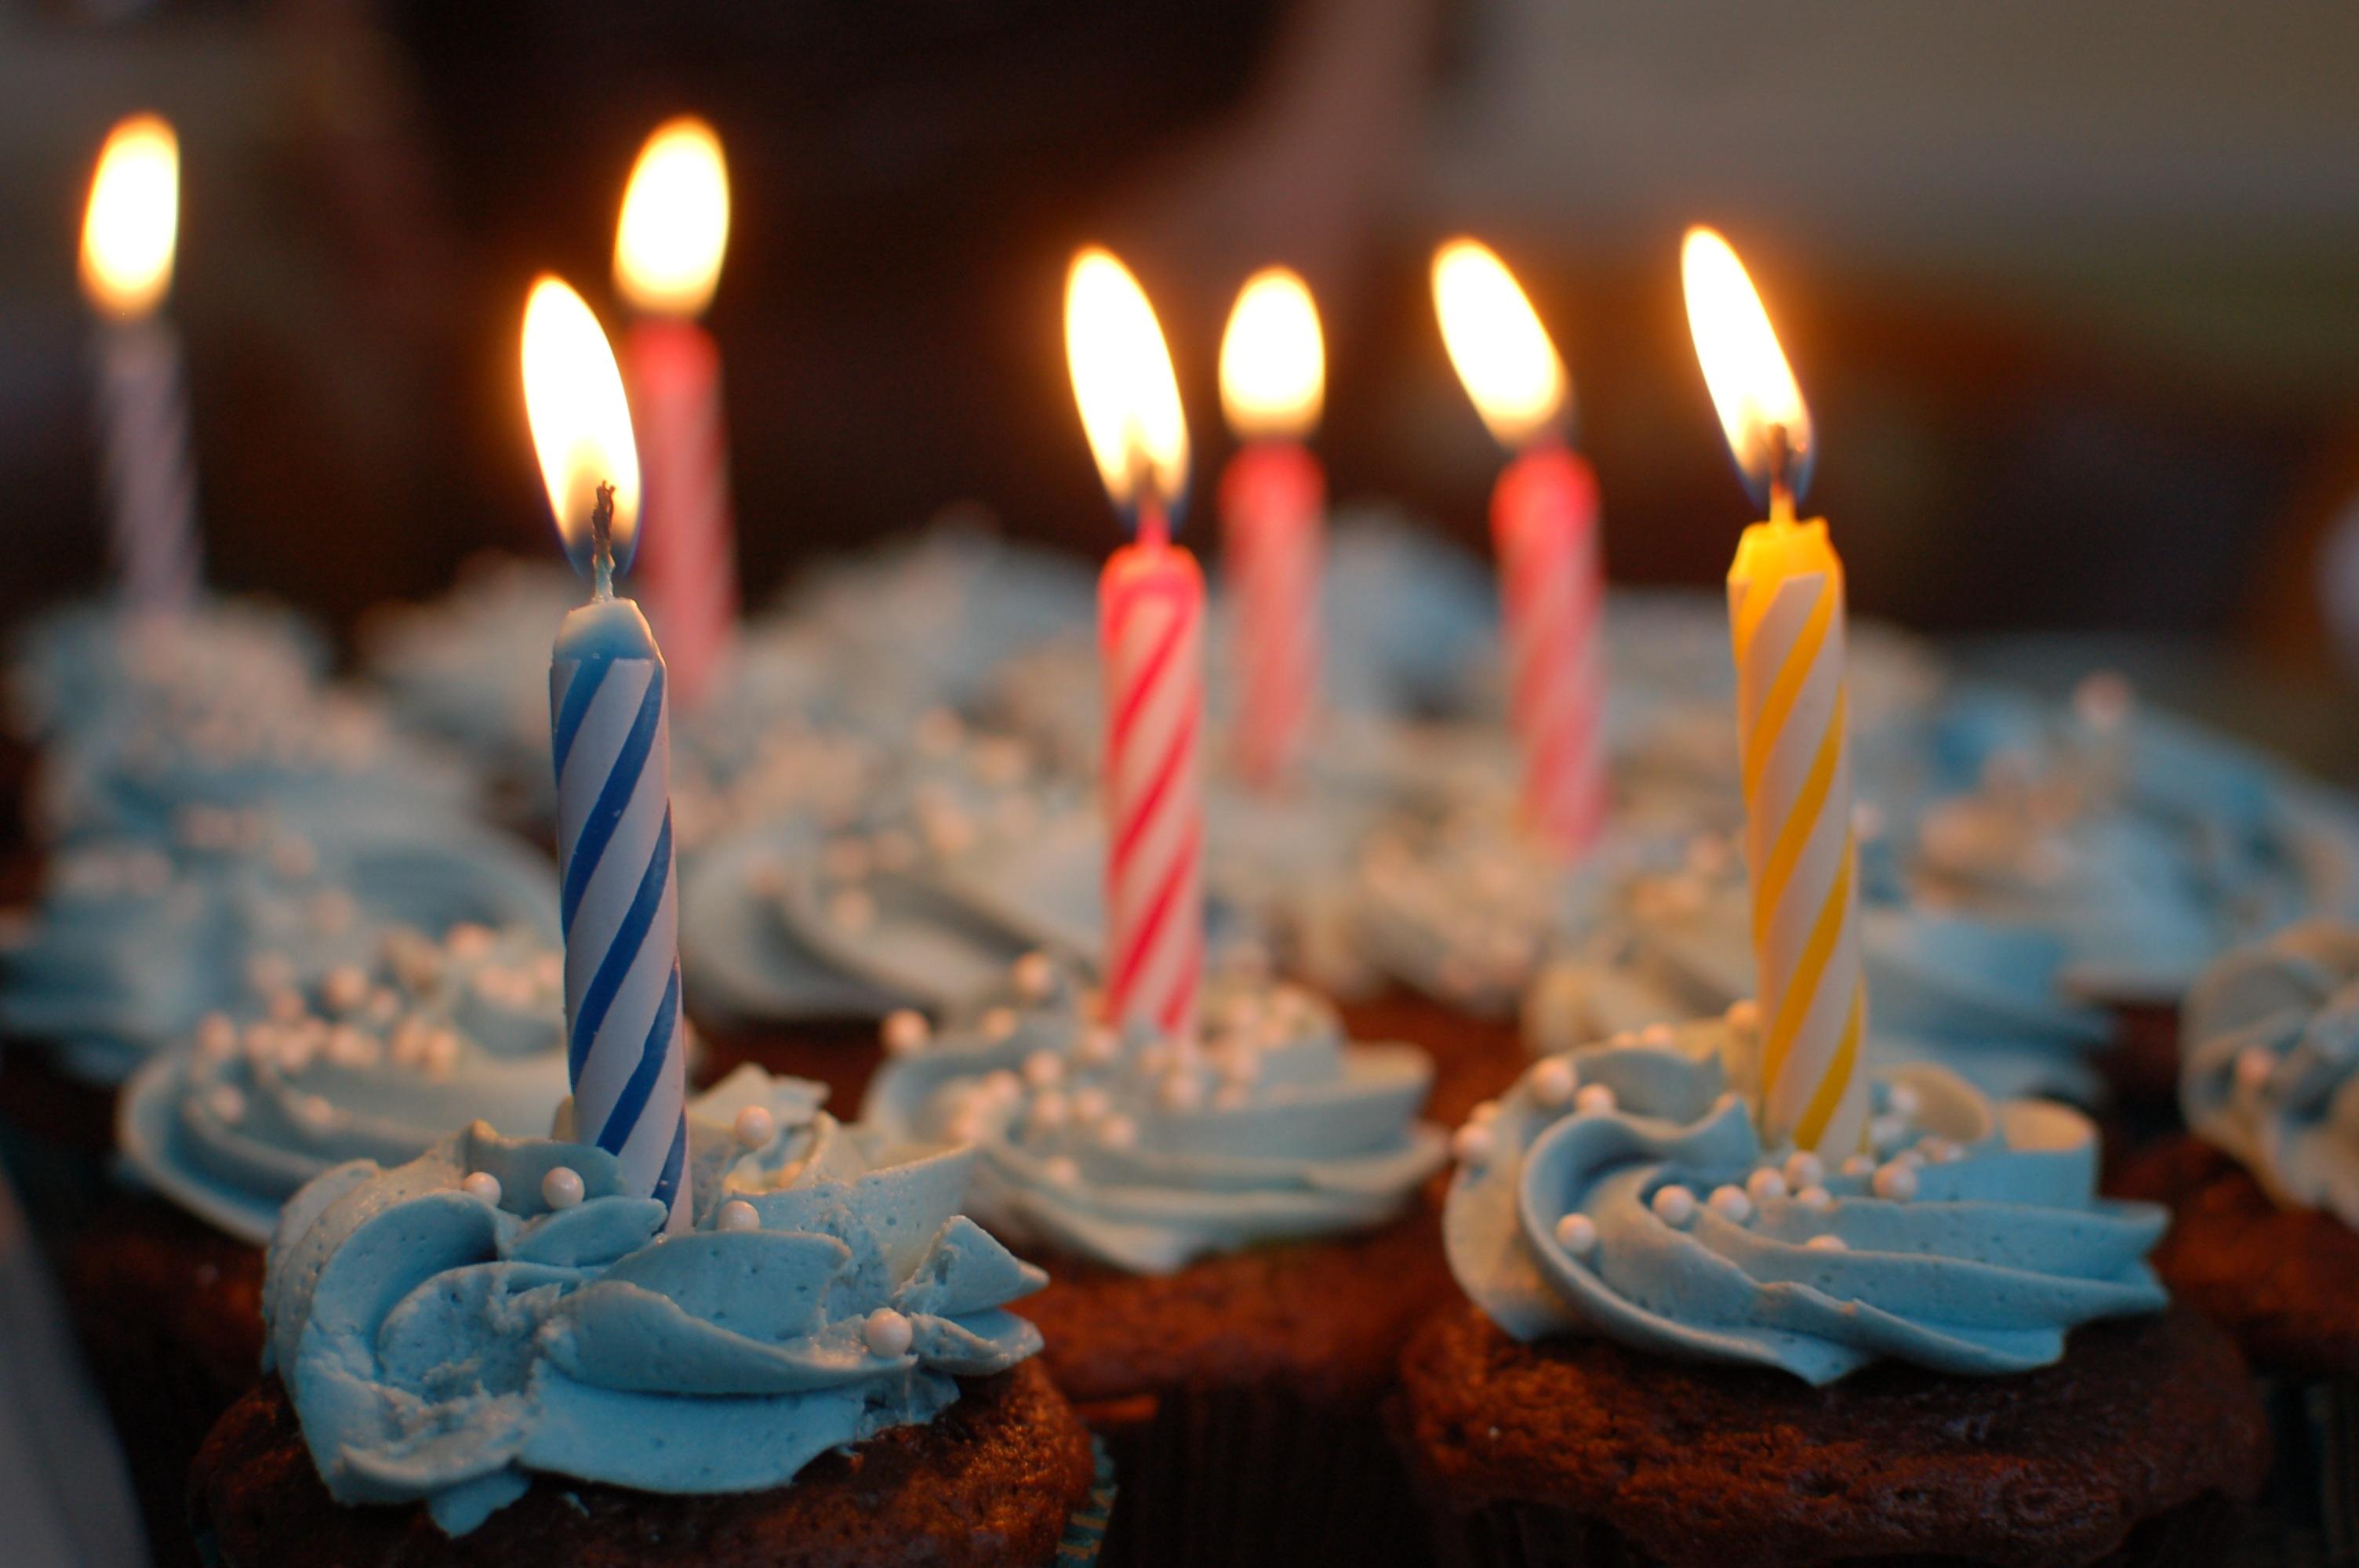 Free Birthday Pictures ~ Free stock photos of birthday · pexels